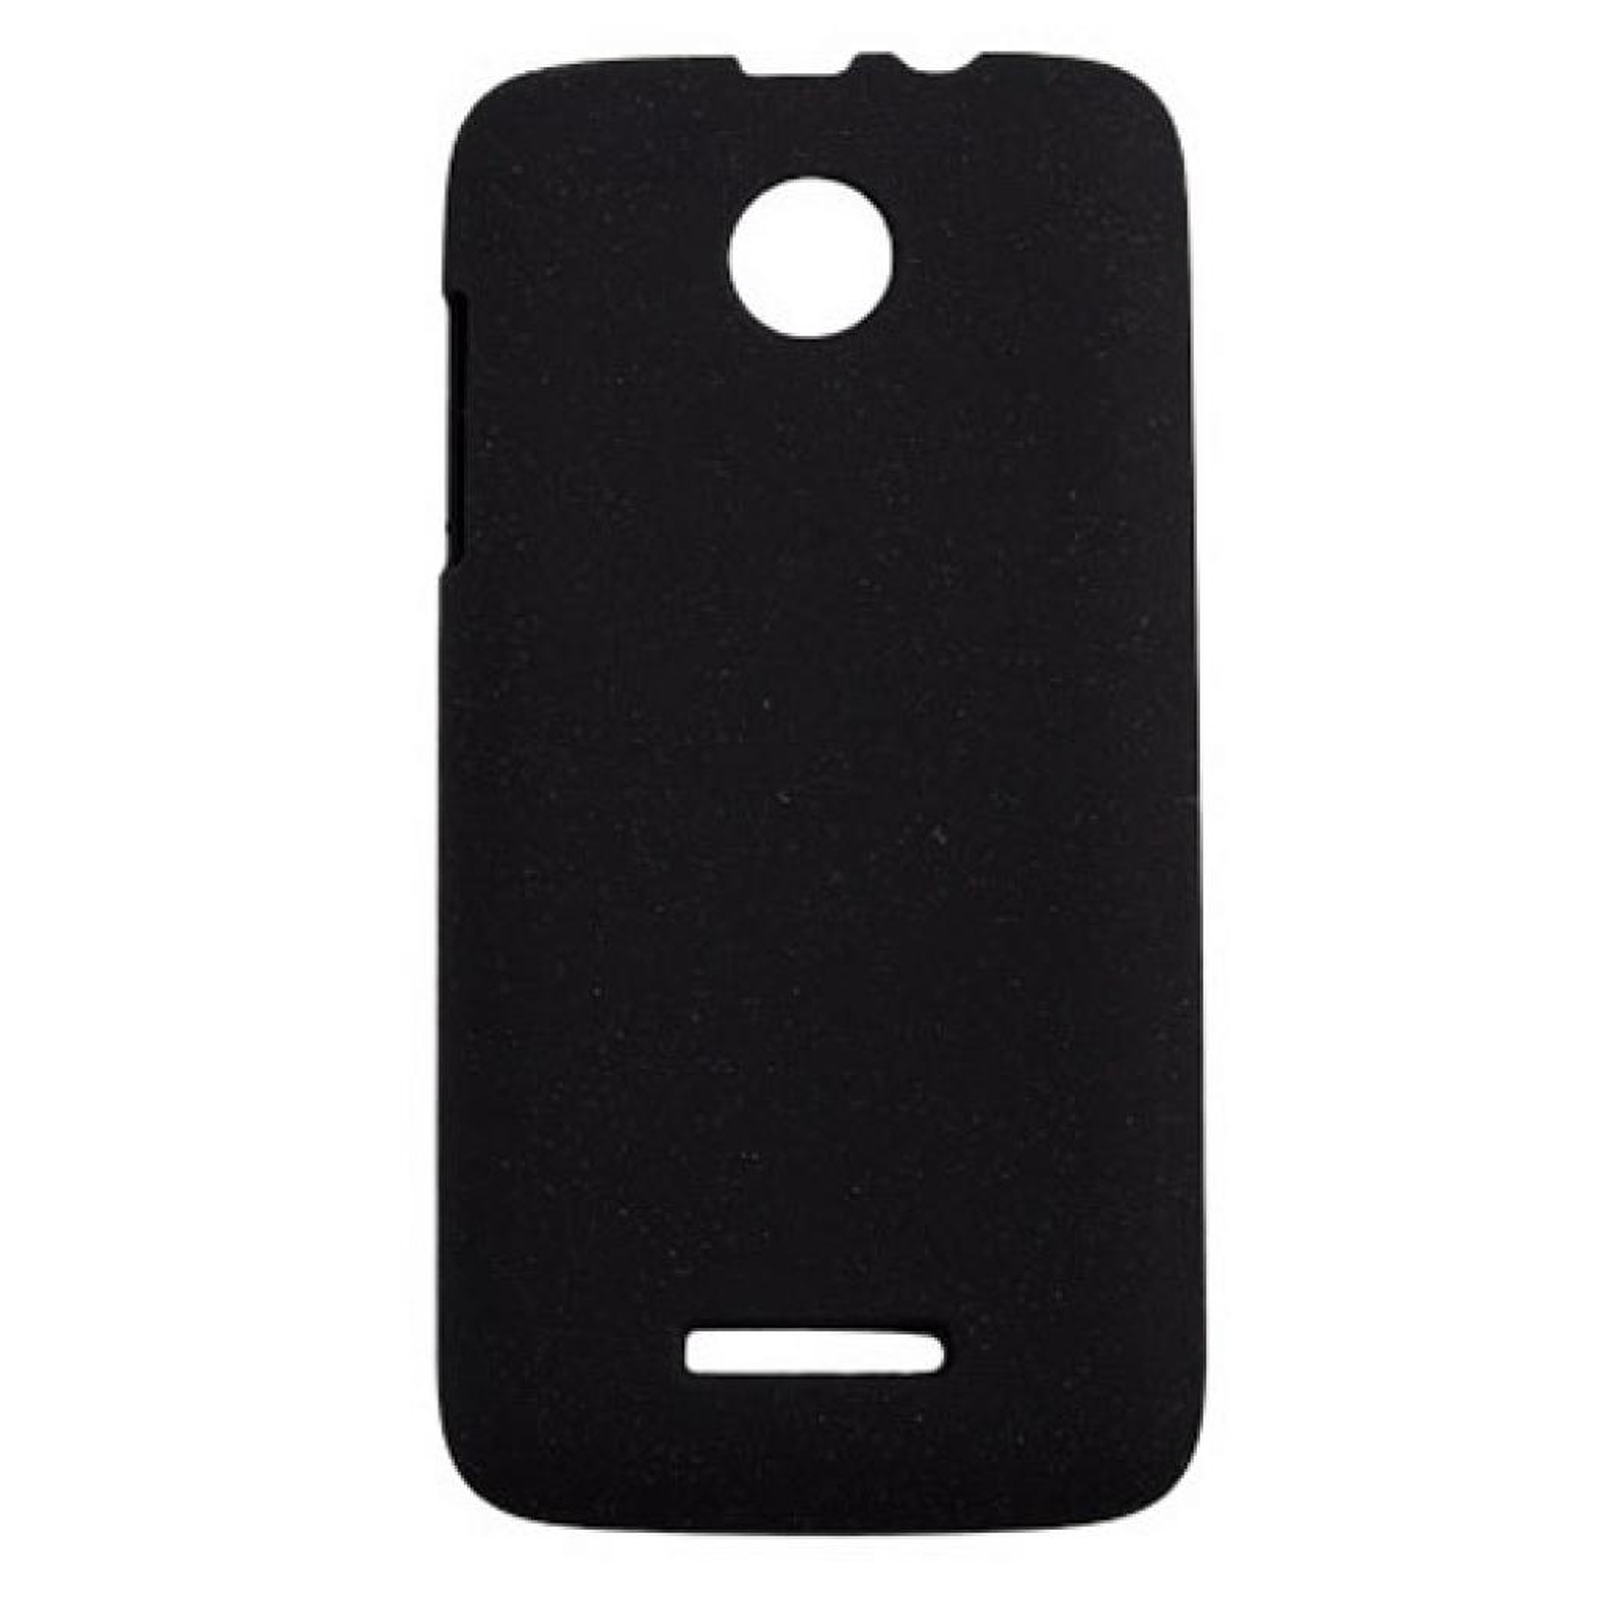 Чехол для моб. телефона Drobak для Lenovo A390 /Shaggy Hard/Black (216386)